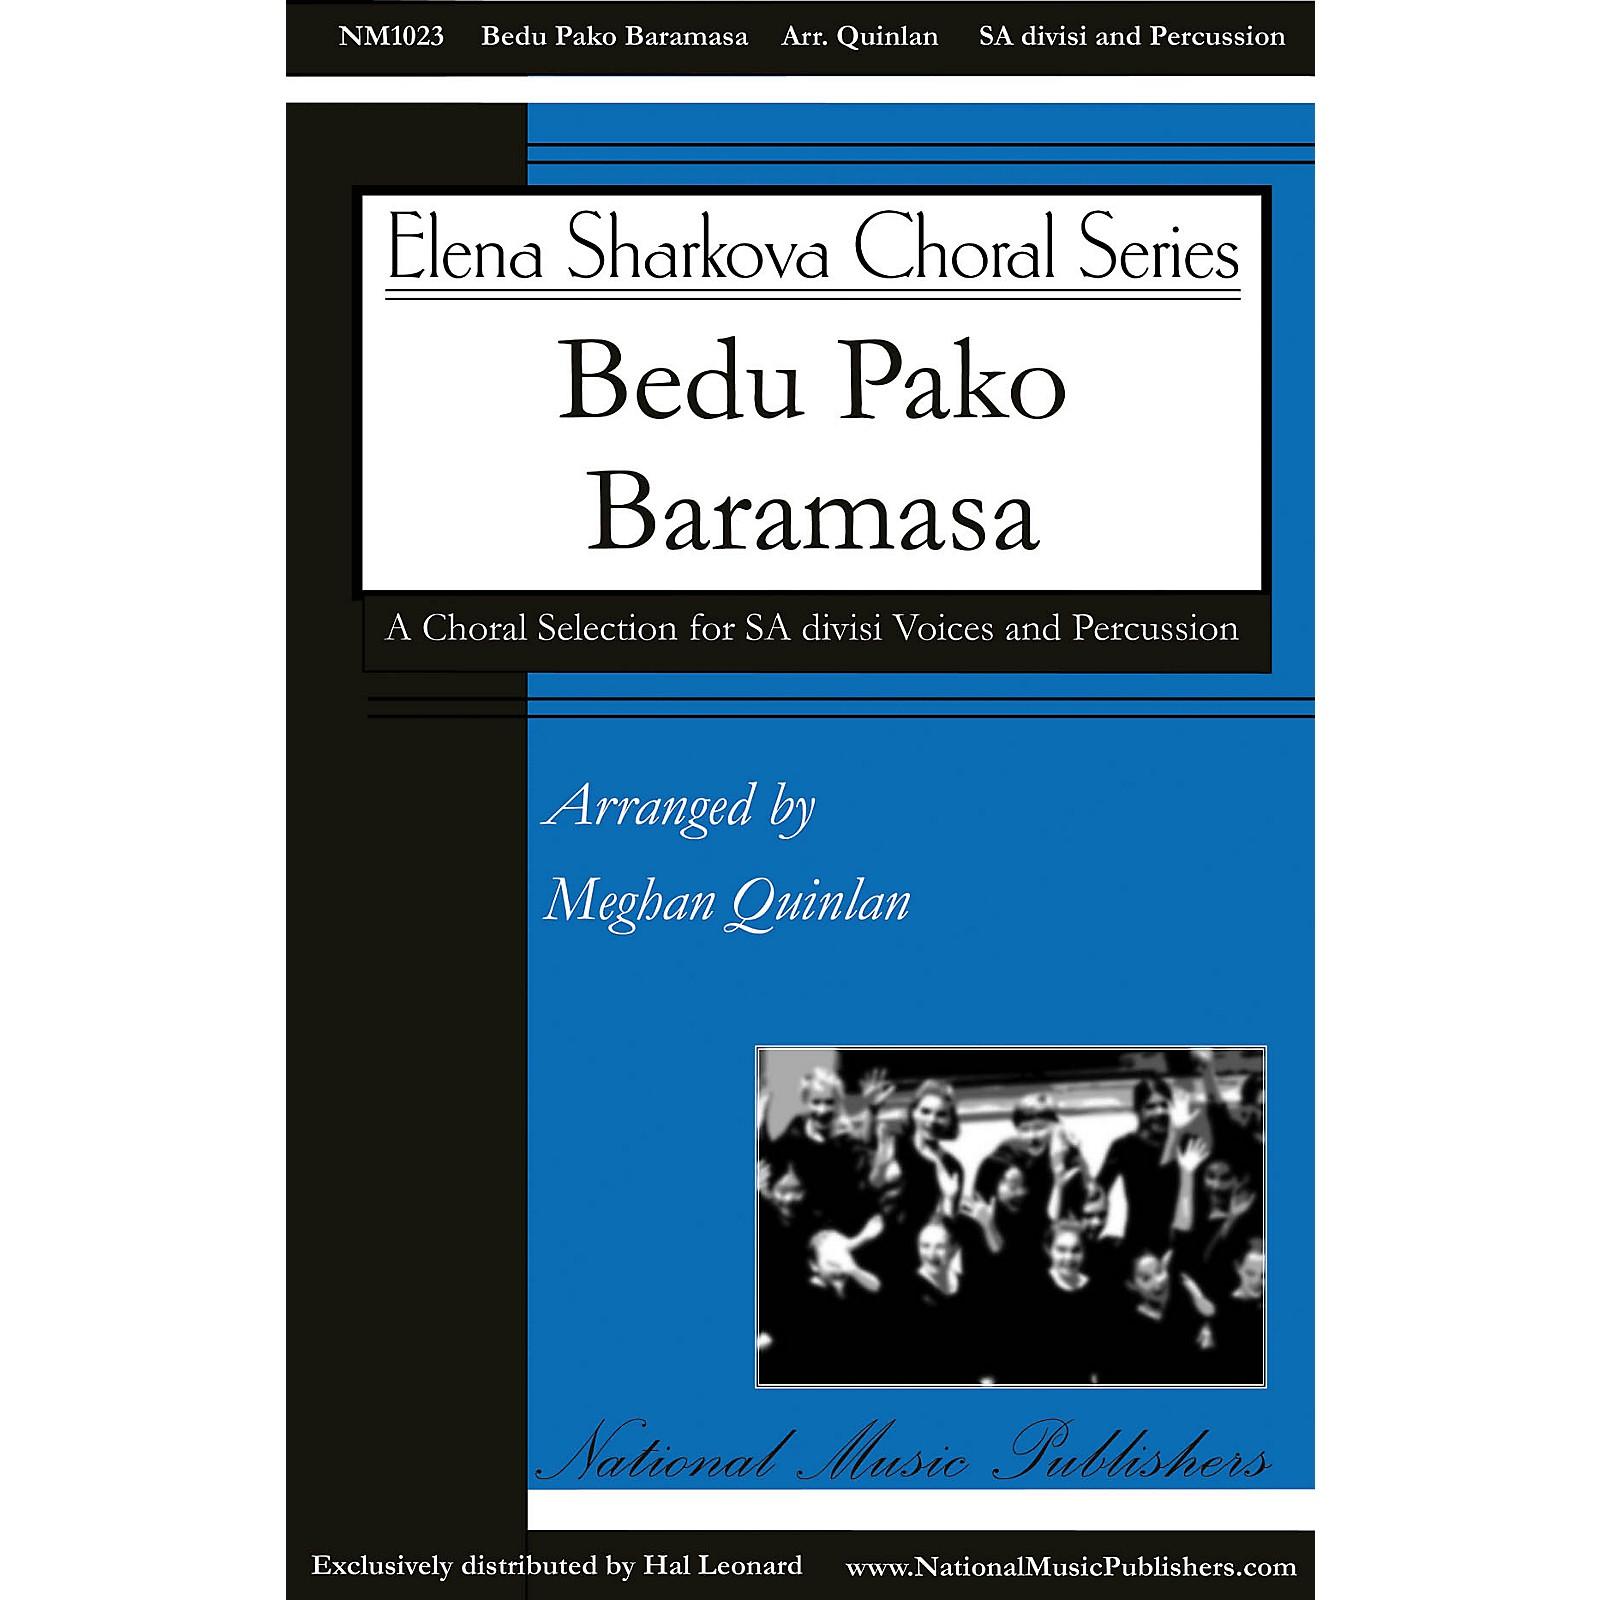 National Music Publishers Bedu Pako Baramasa SA arranged by Meghan Quinlan